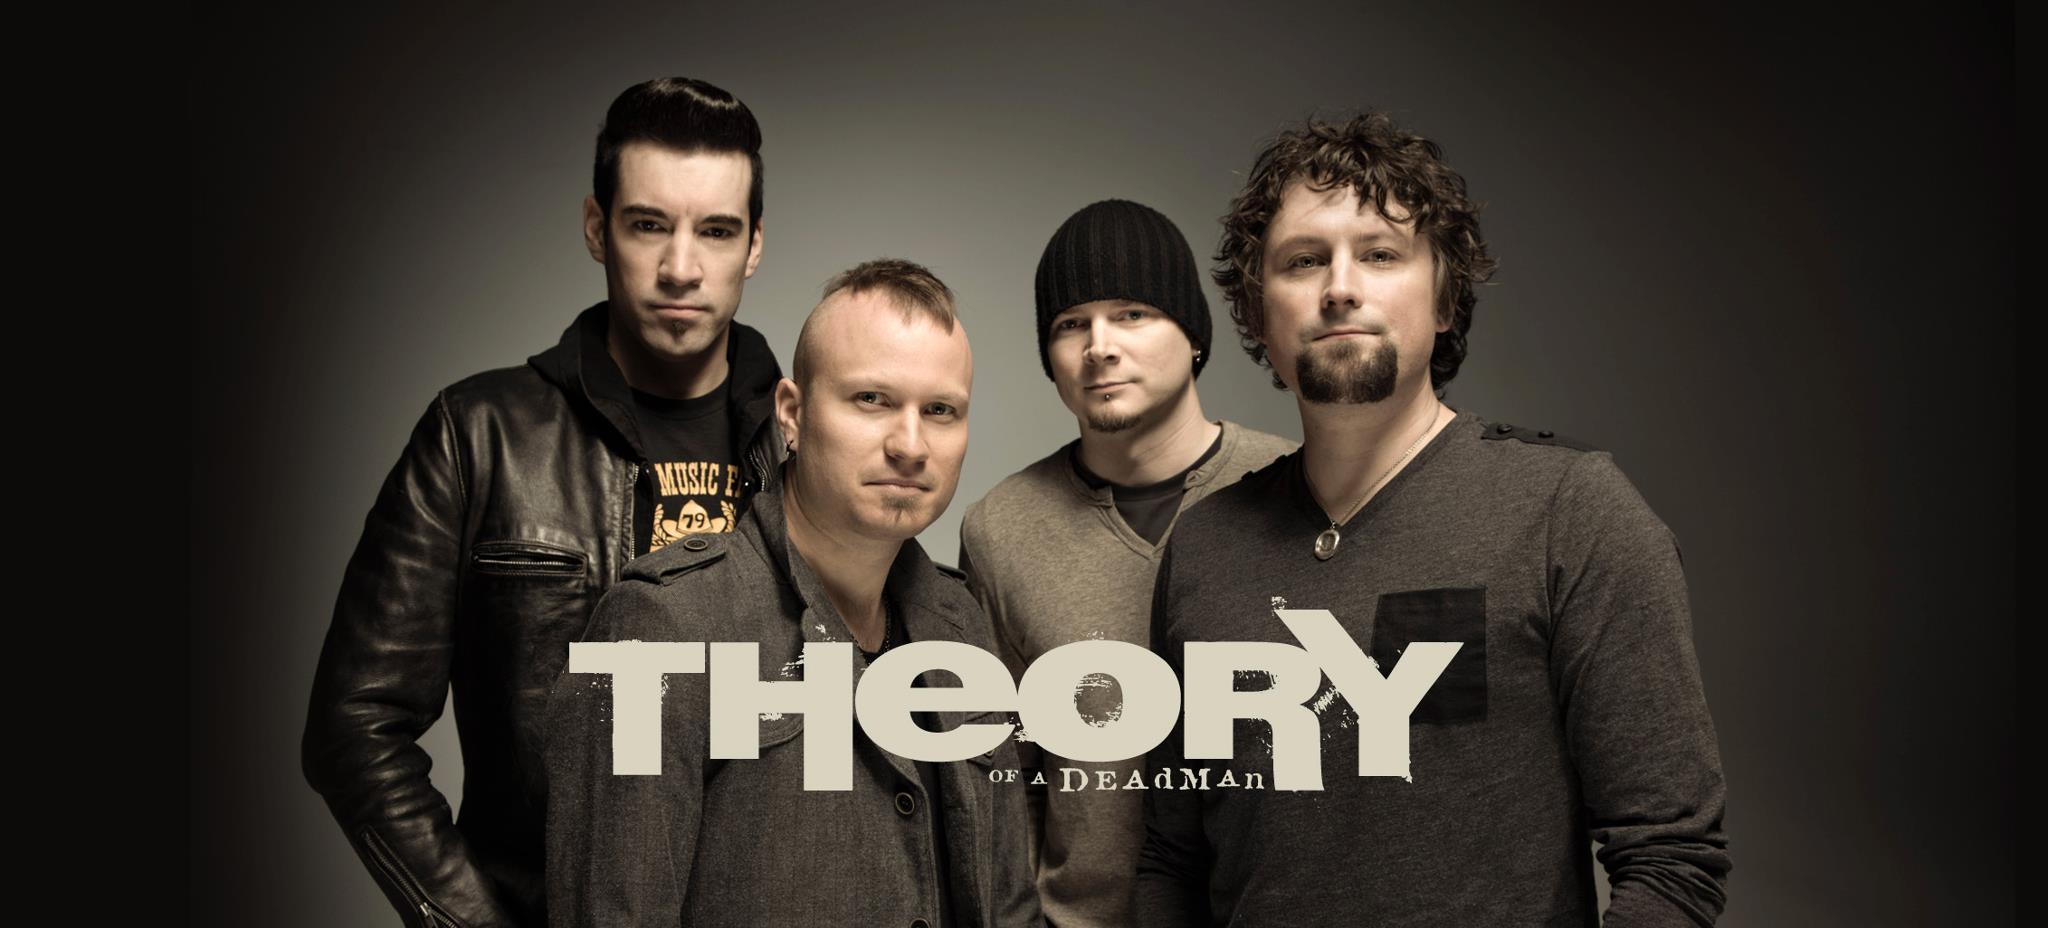 Theory Of A Deadman Concert Tour